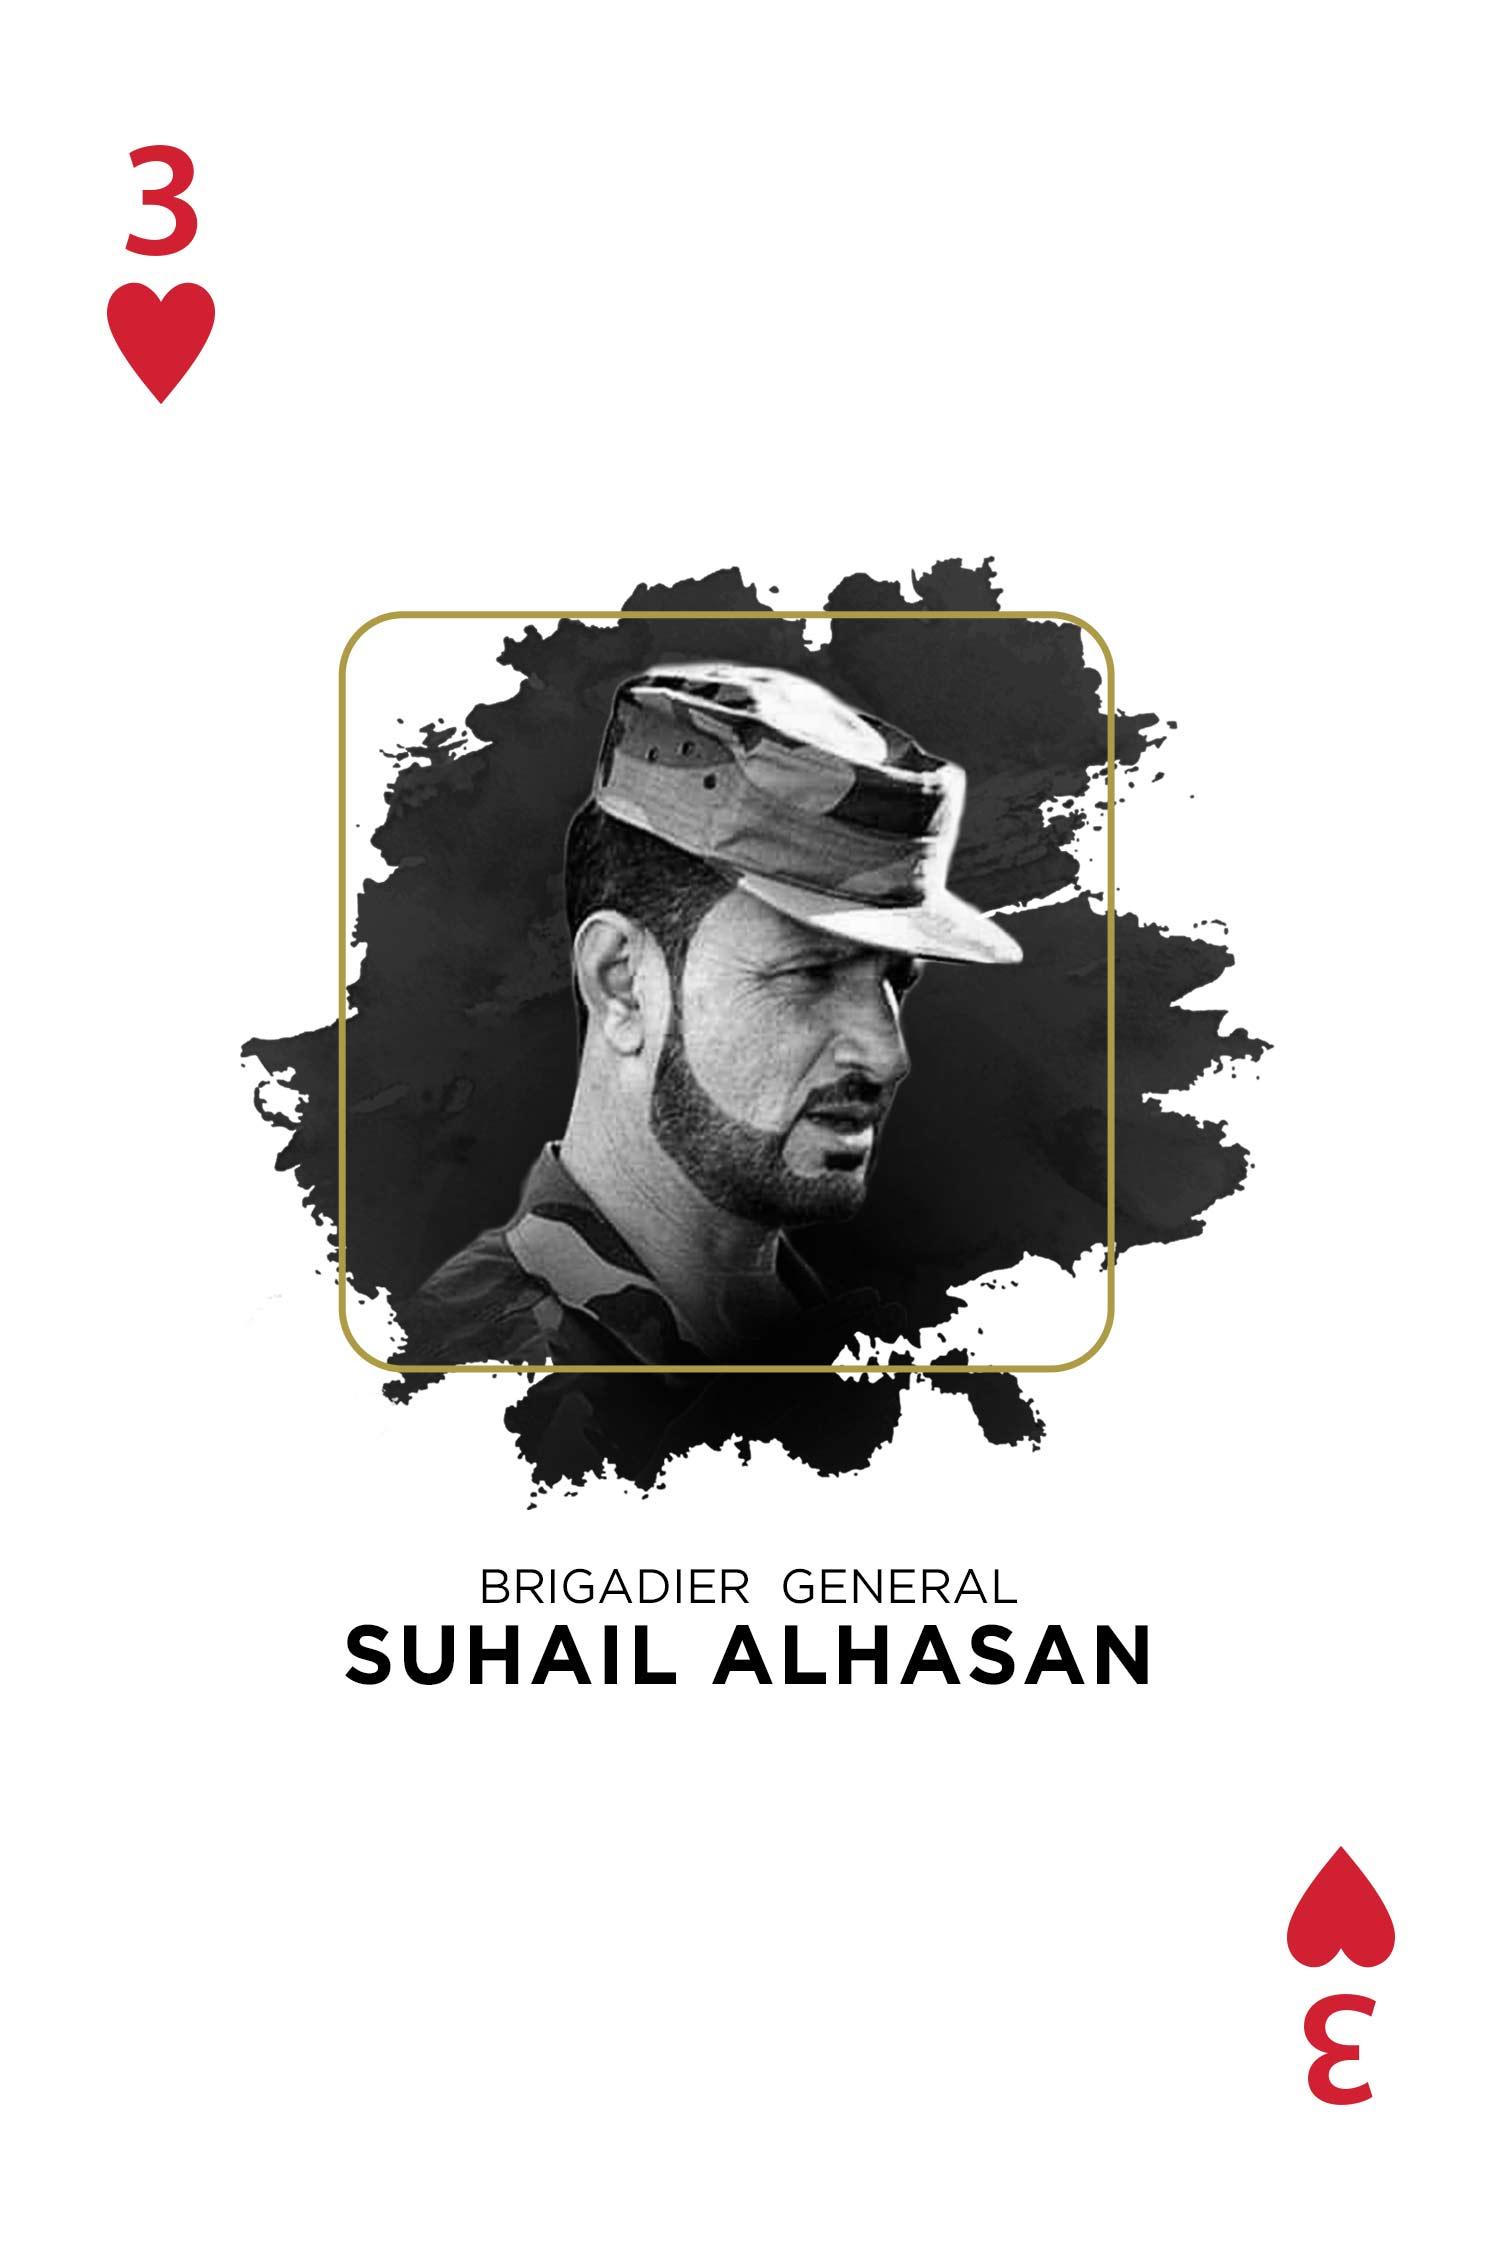 Pro Justice - Suheil al-Hassan